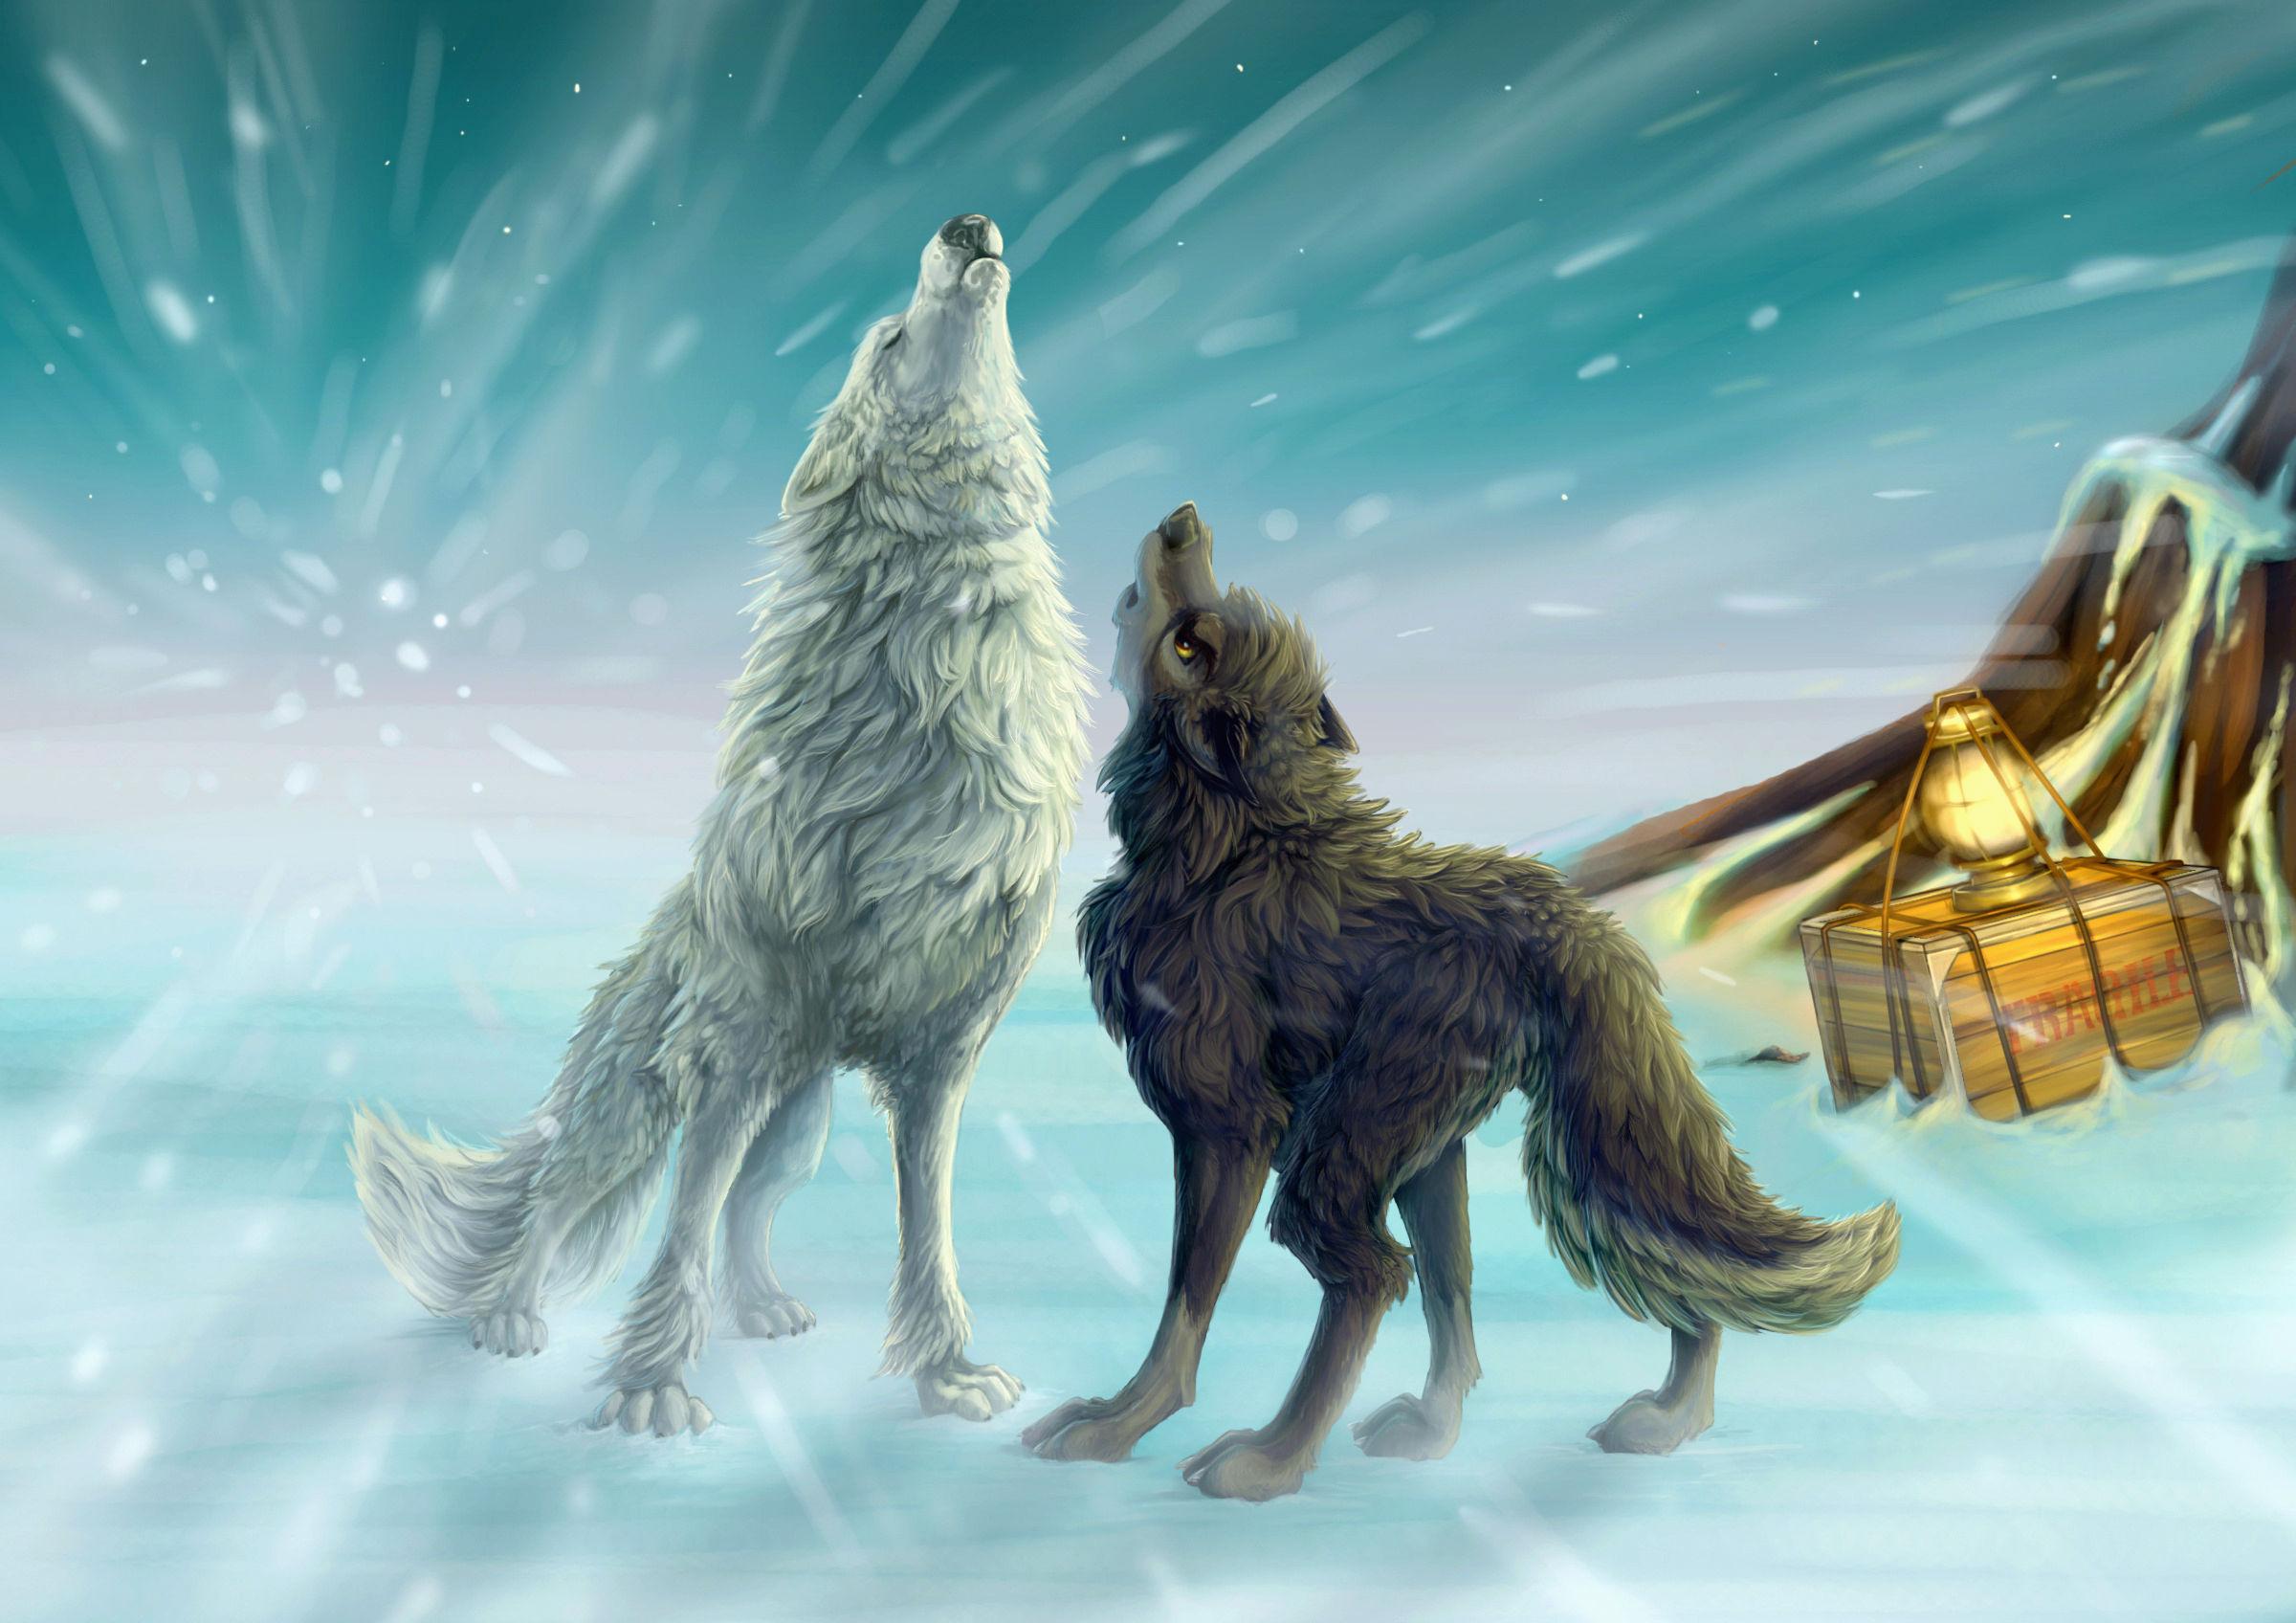 anime wolf wallpapers desktop cool anime wolf pics desktop hd anime 2400x1696